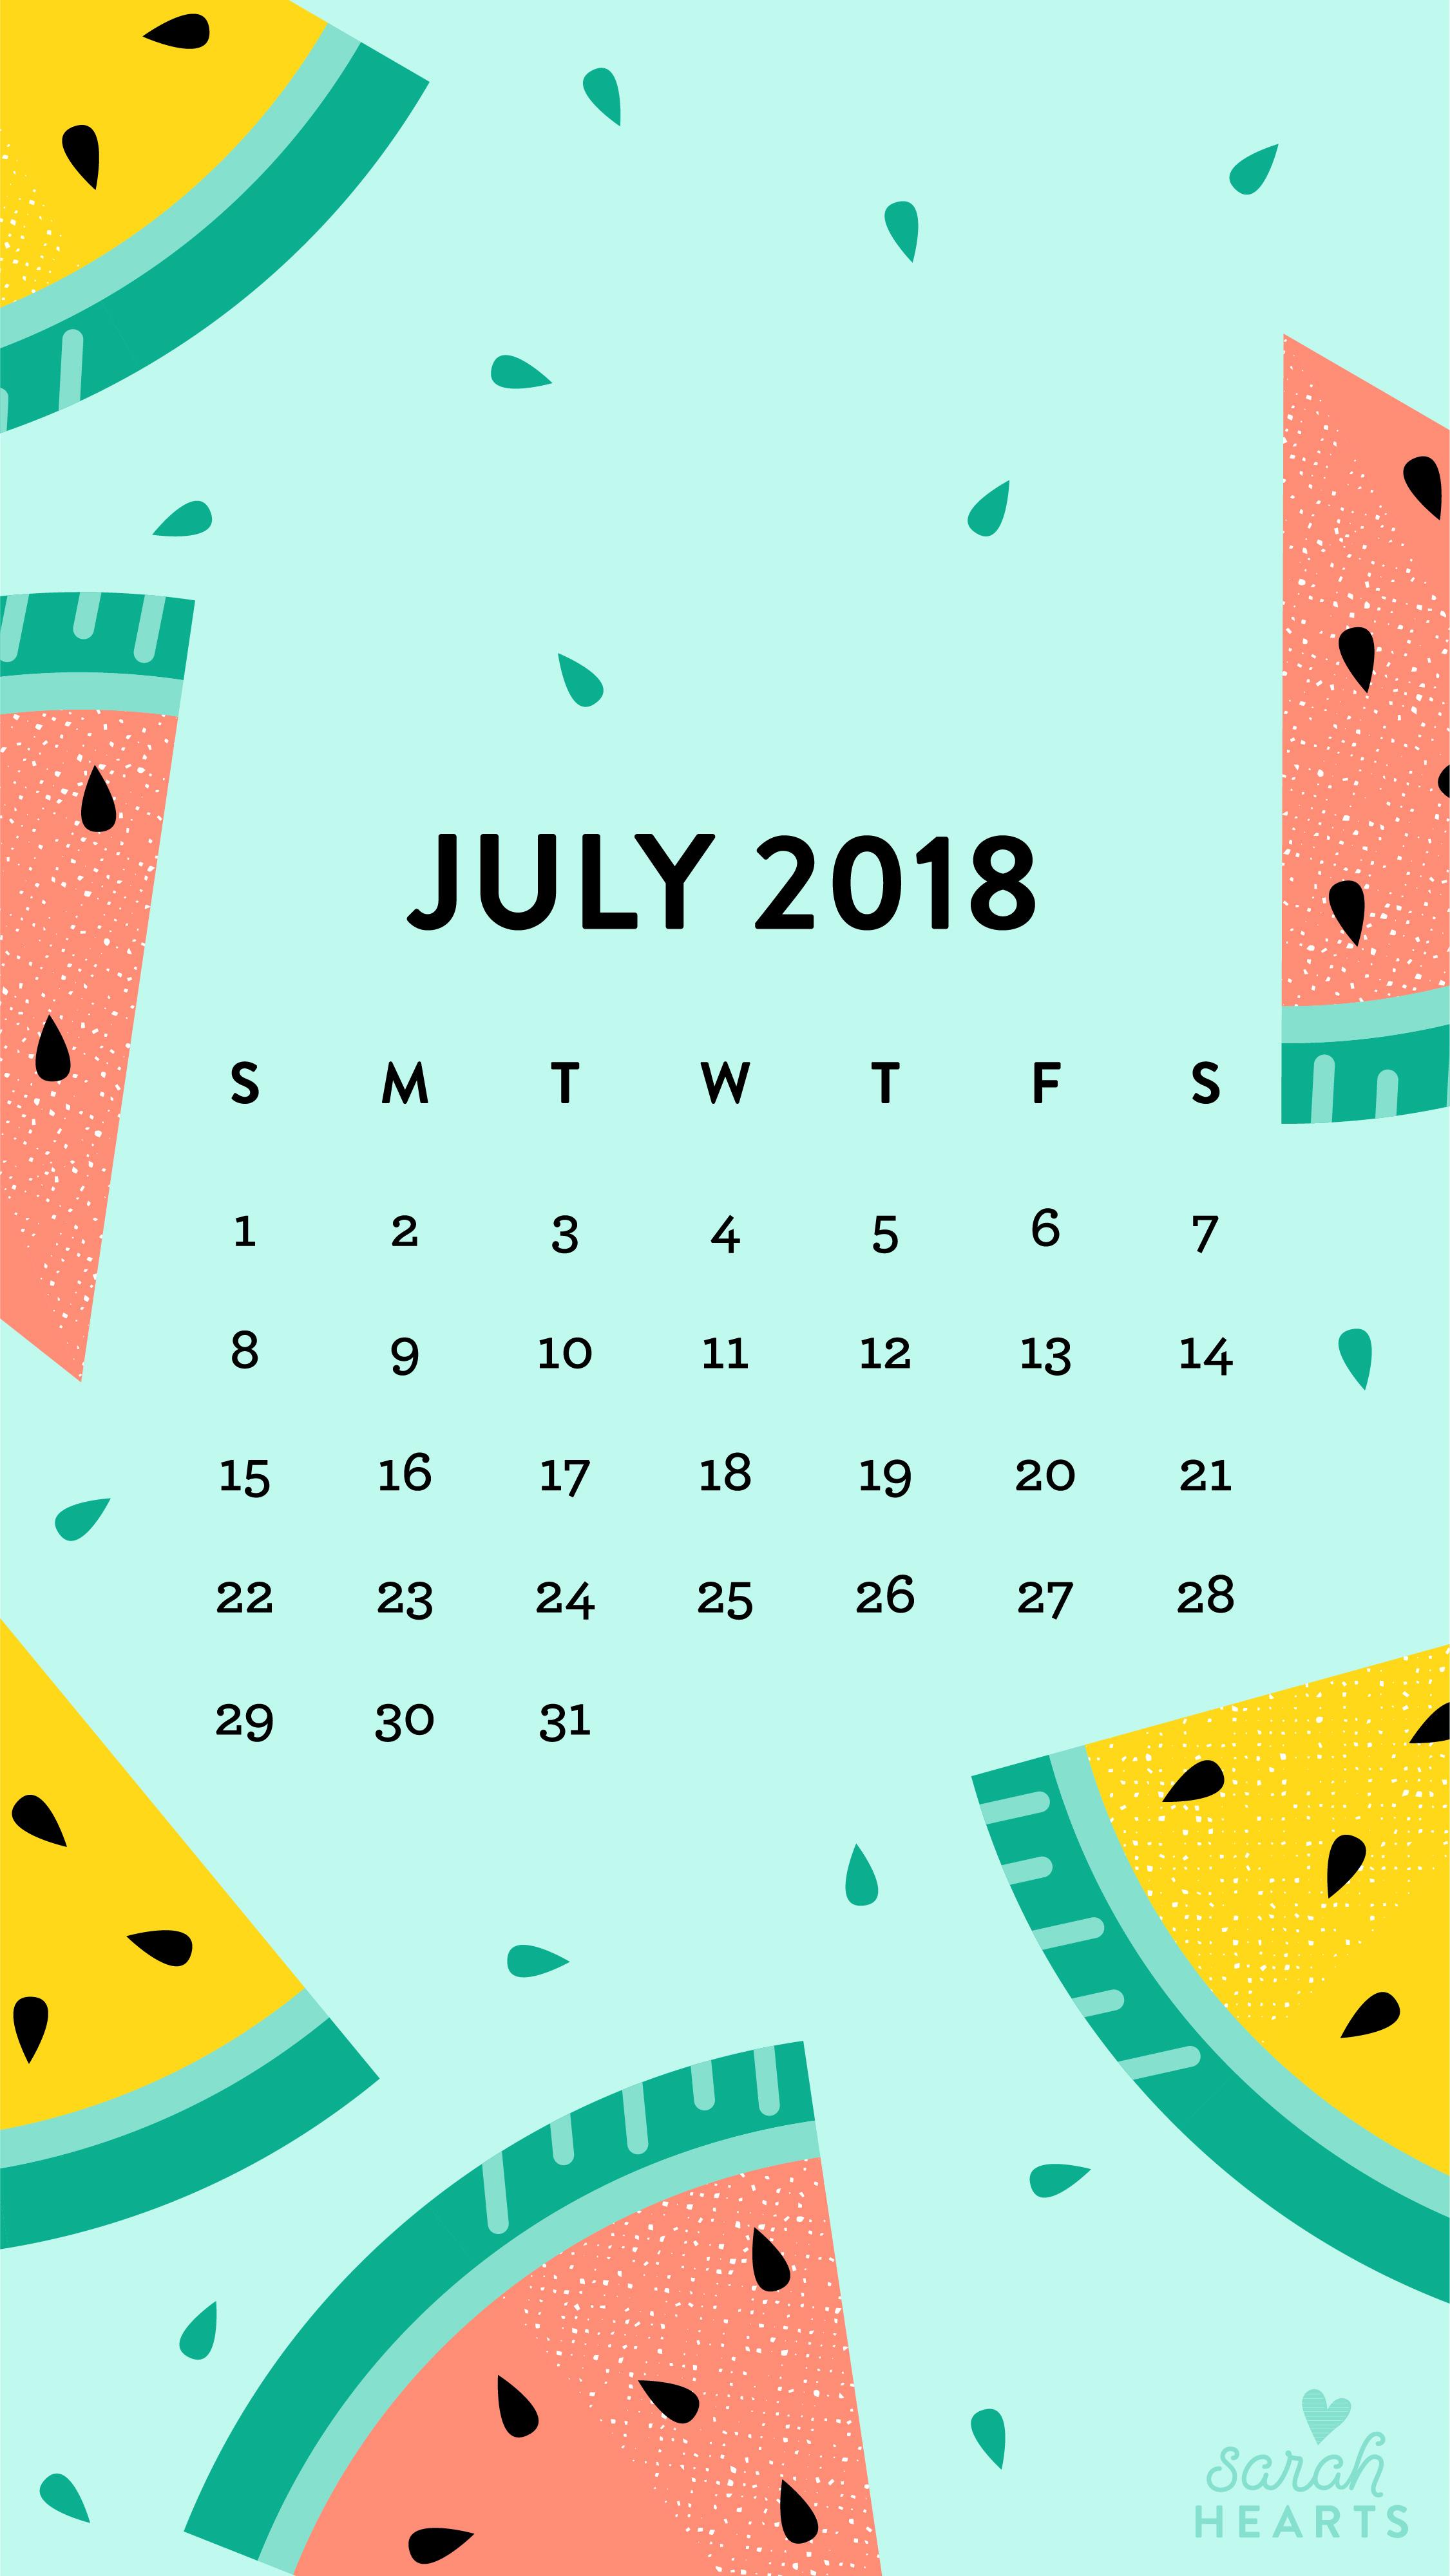 July 2018 Watermelon Calendar Wallpaper   Sarah Hearts 2251x4000